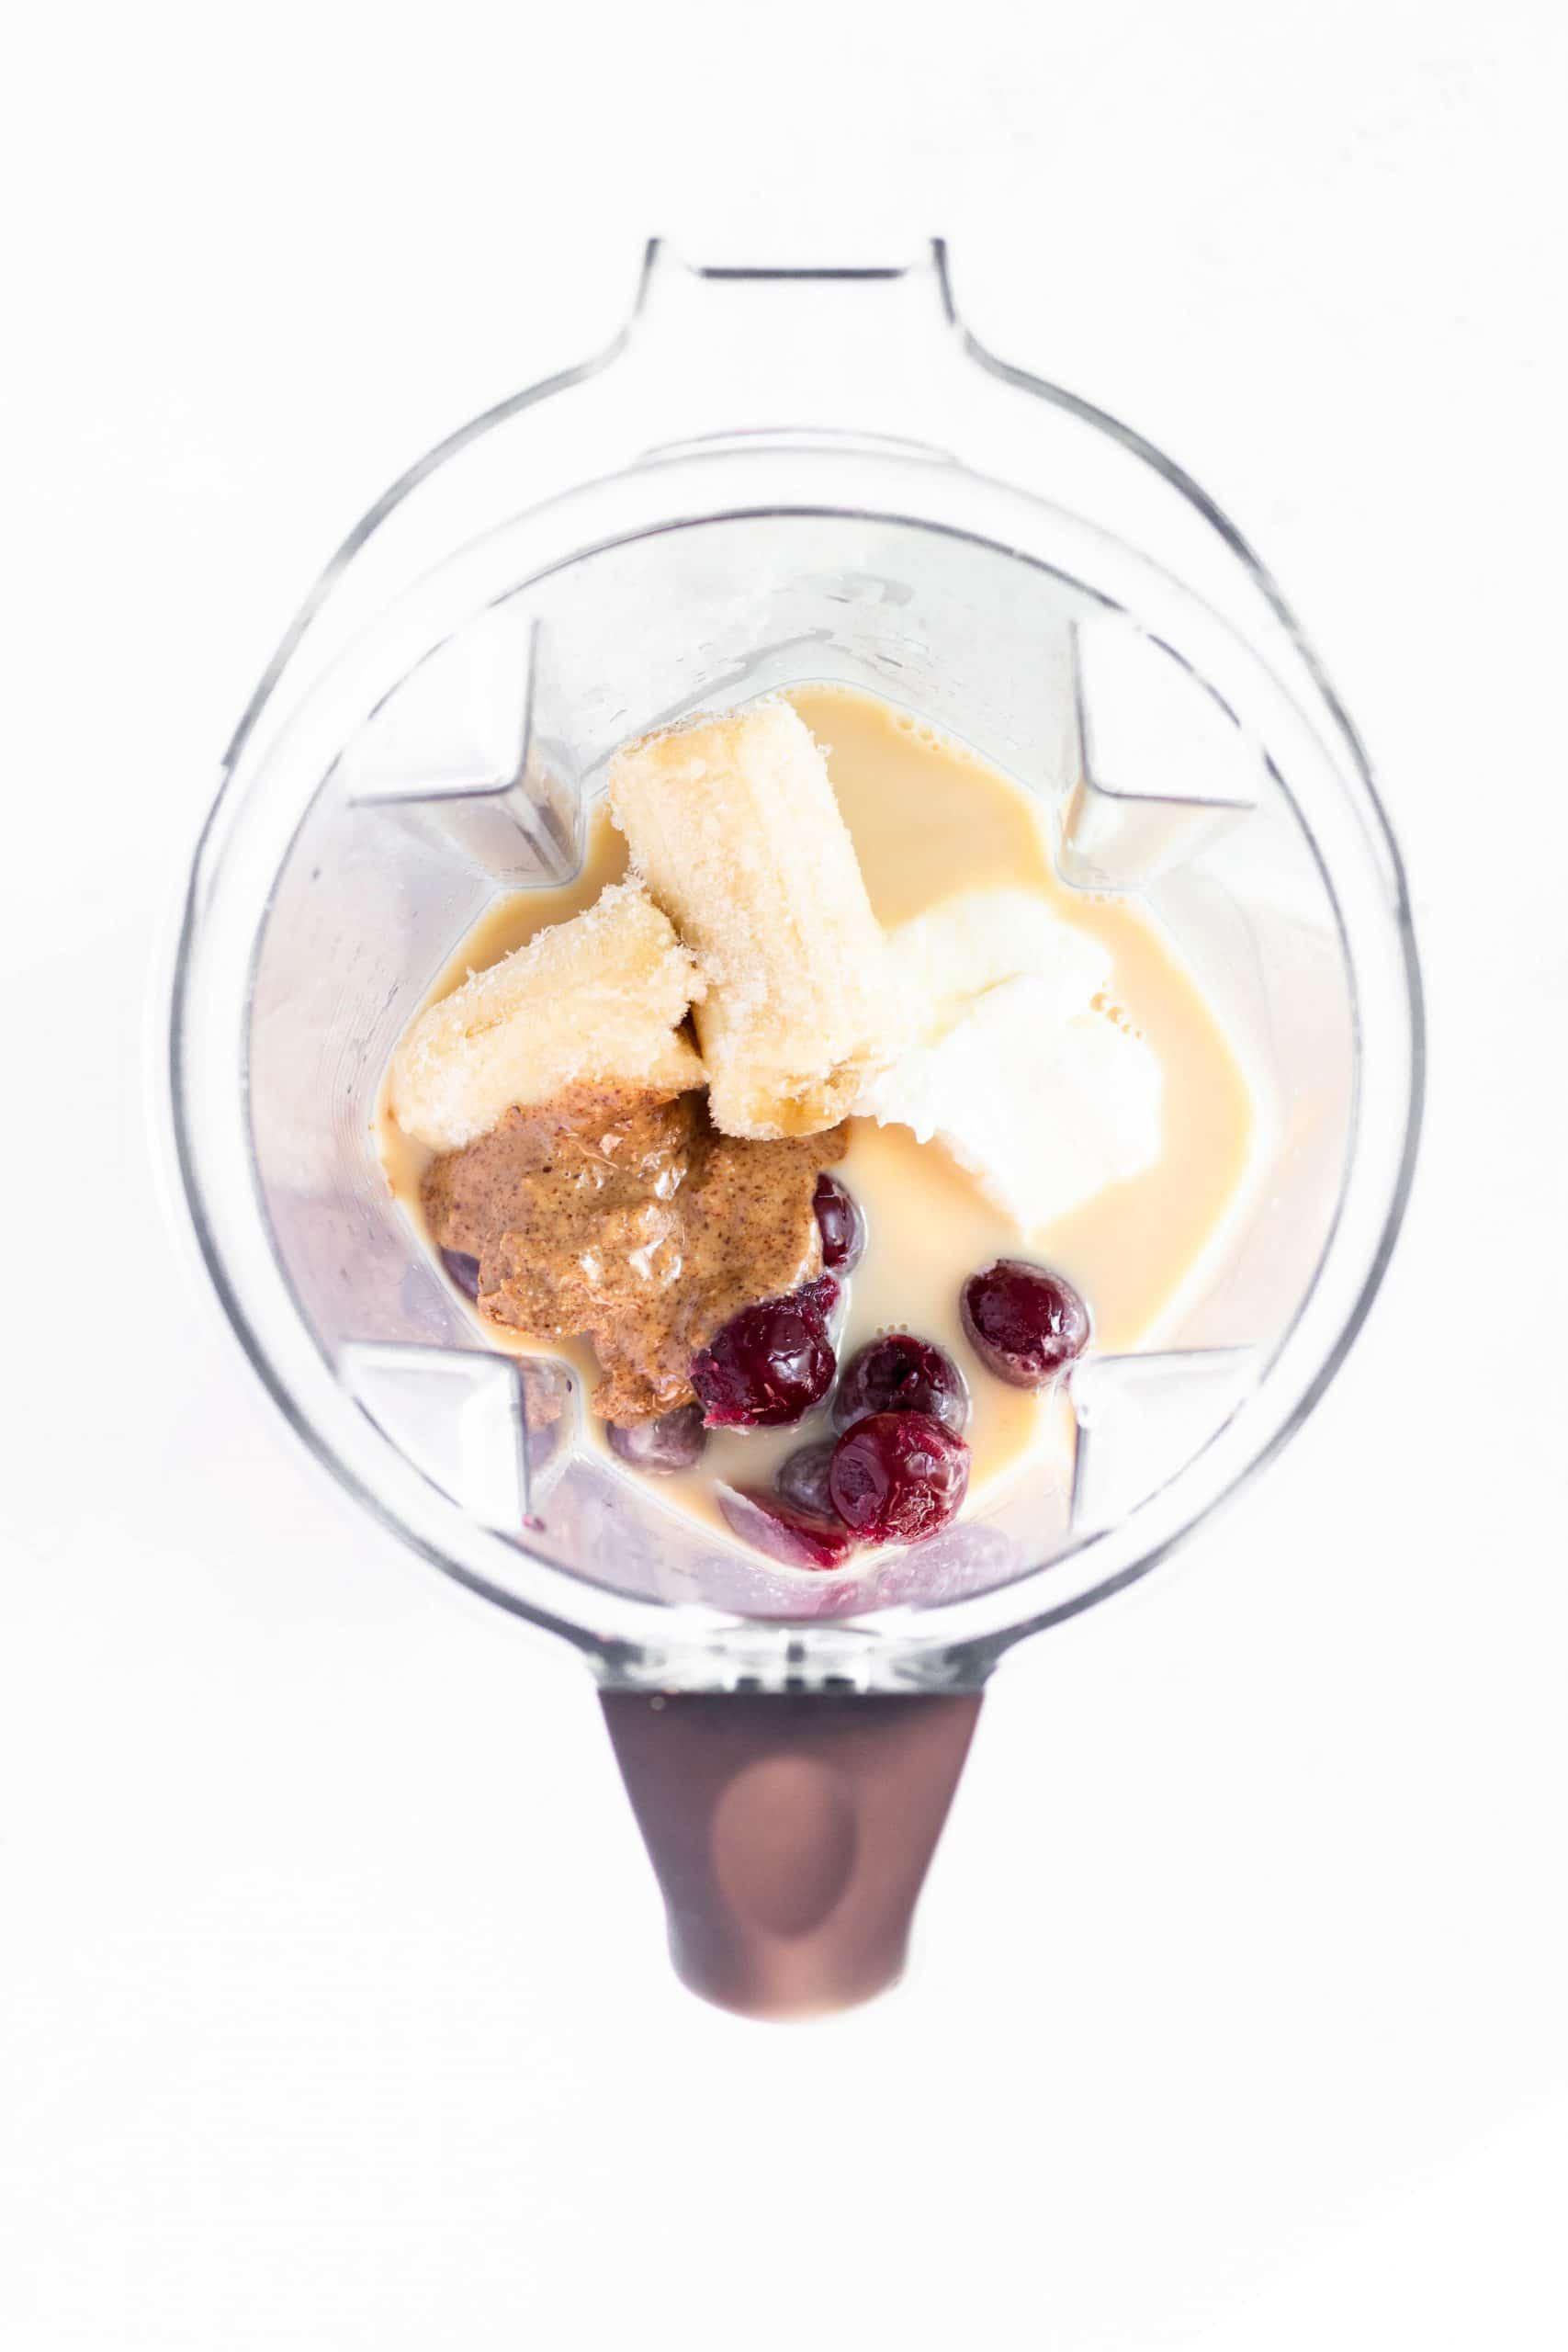 Cherry Almond Smoothie | Tara Rochford Nutrition #smoothie #freesample #healthysnack